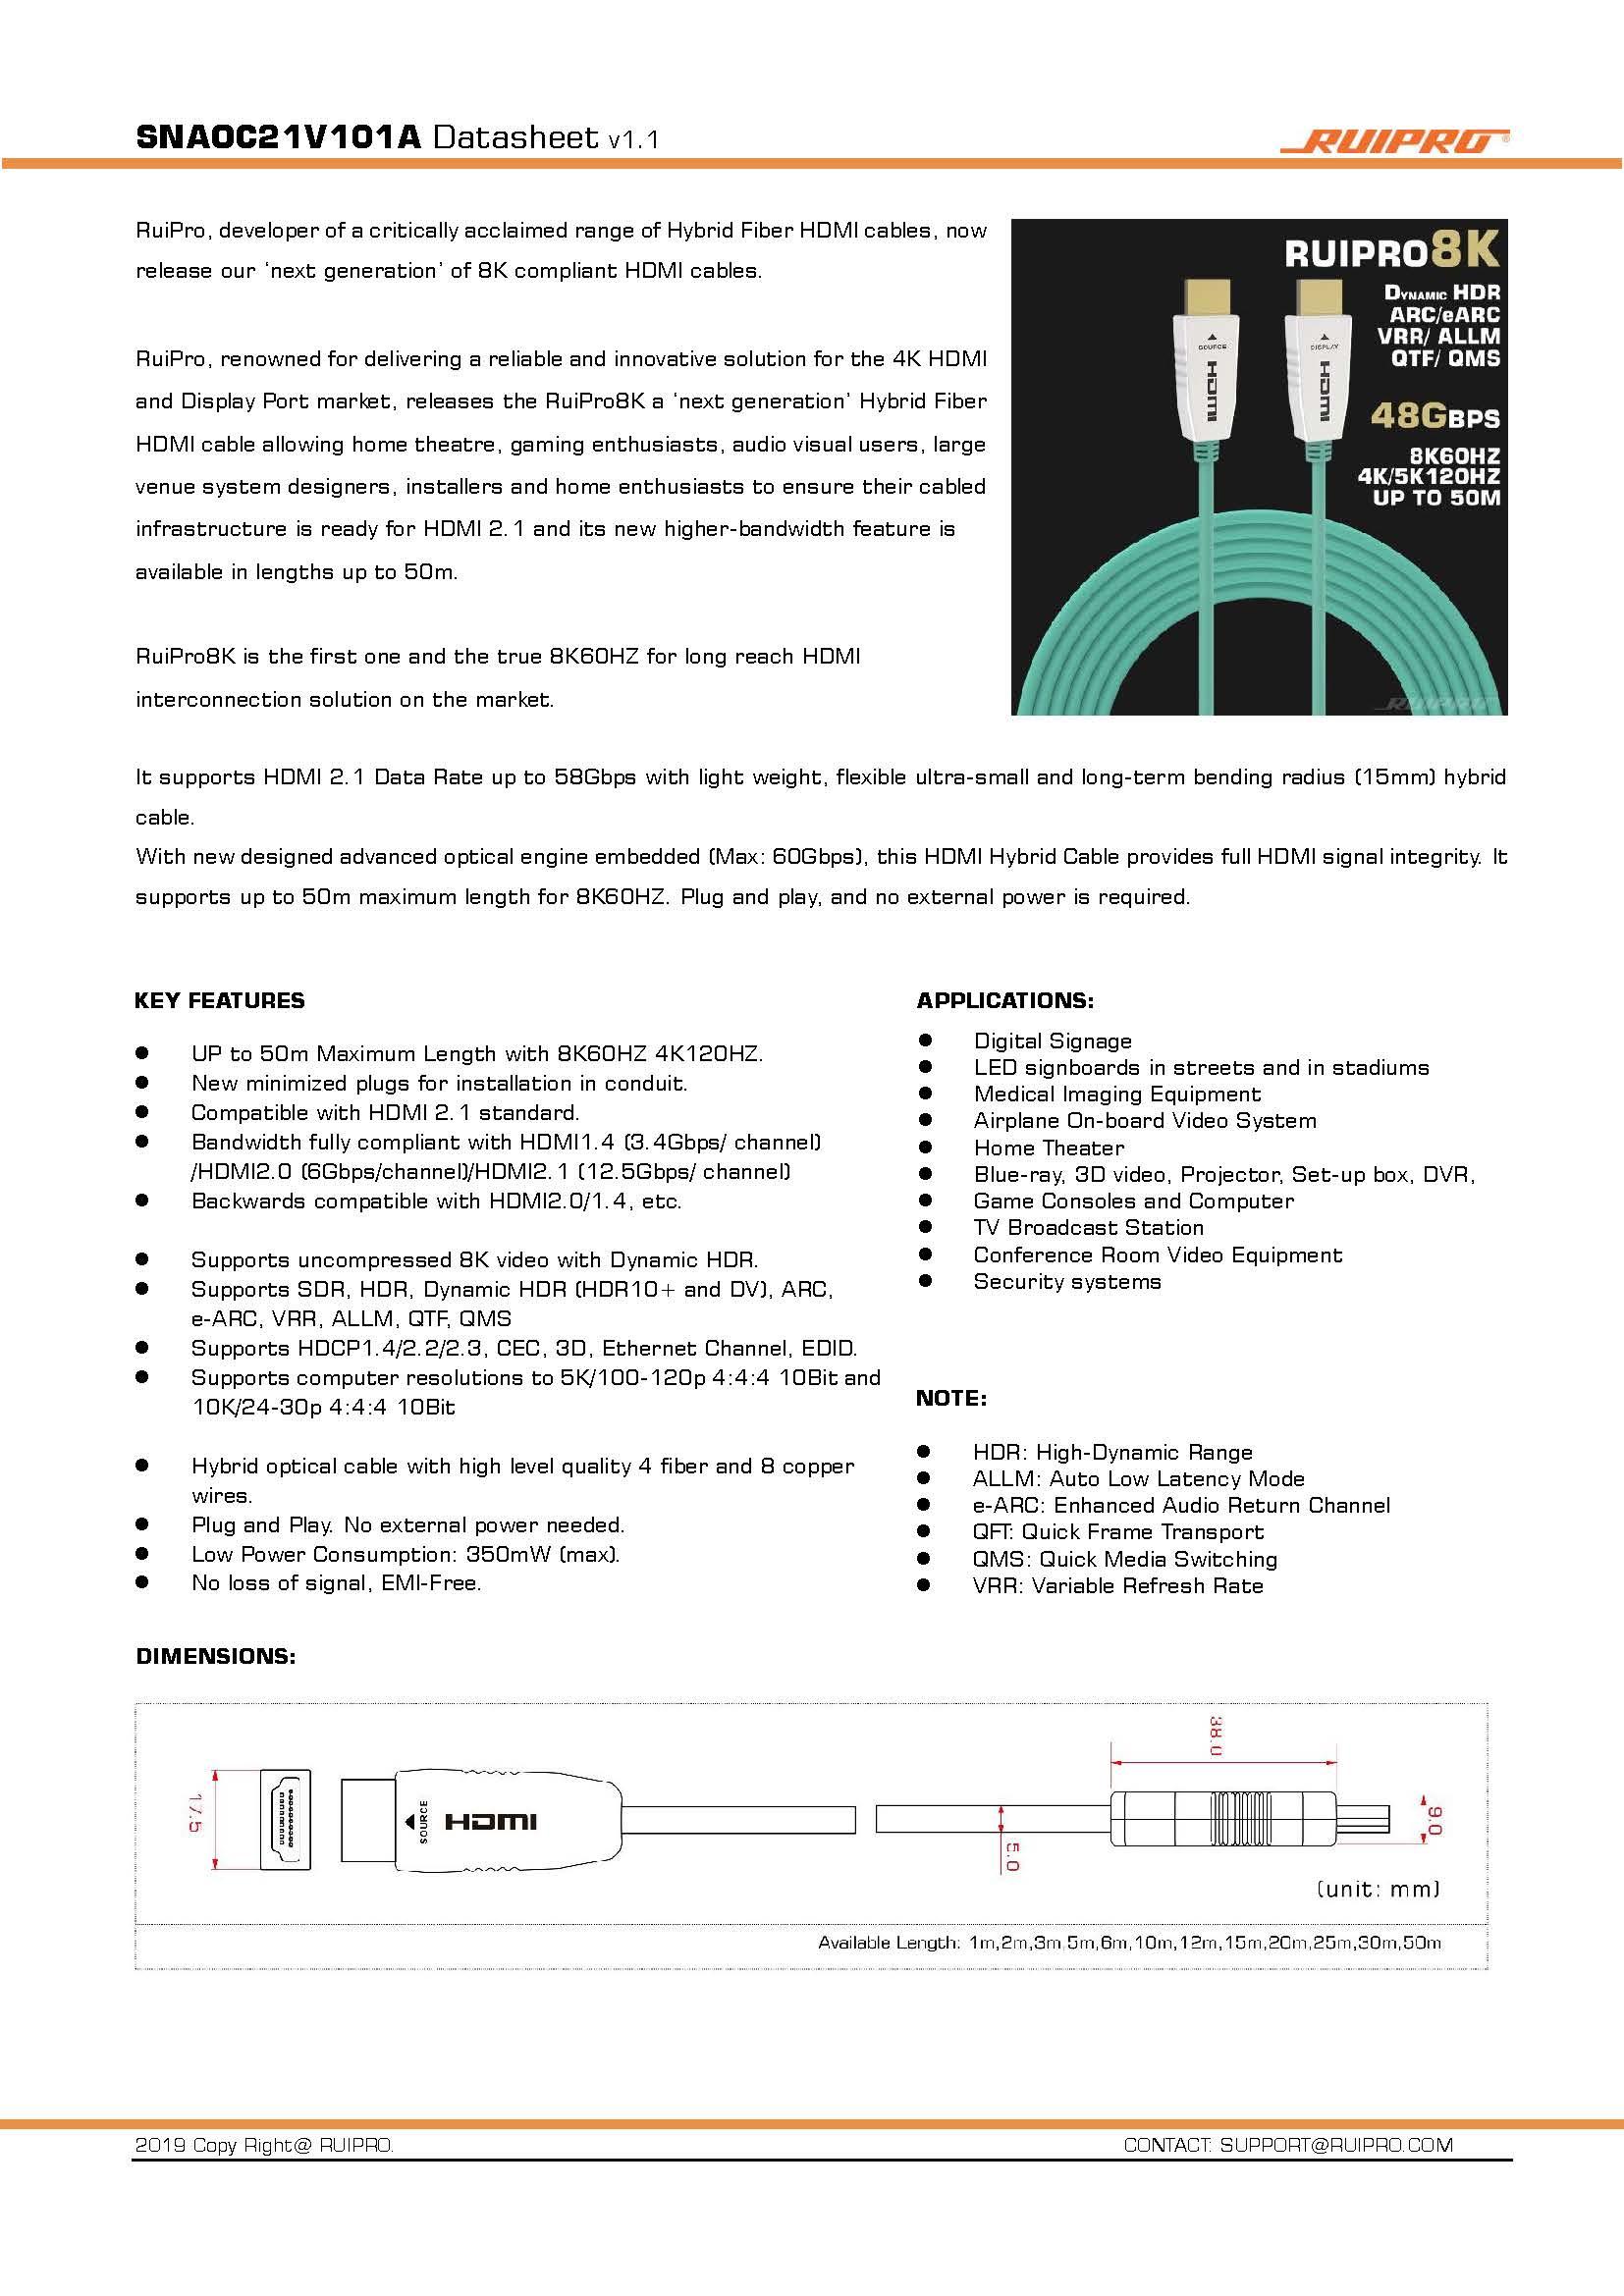 MundoAudio Zaragoza - Página 7 RUIPRO8K%20HDMI%202.1%20CABLES%20-%20DATA%20SHEET_Page_1